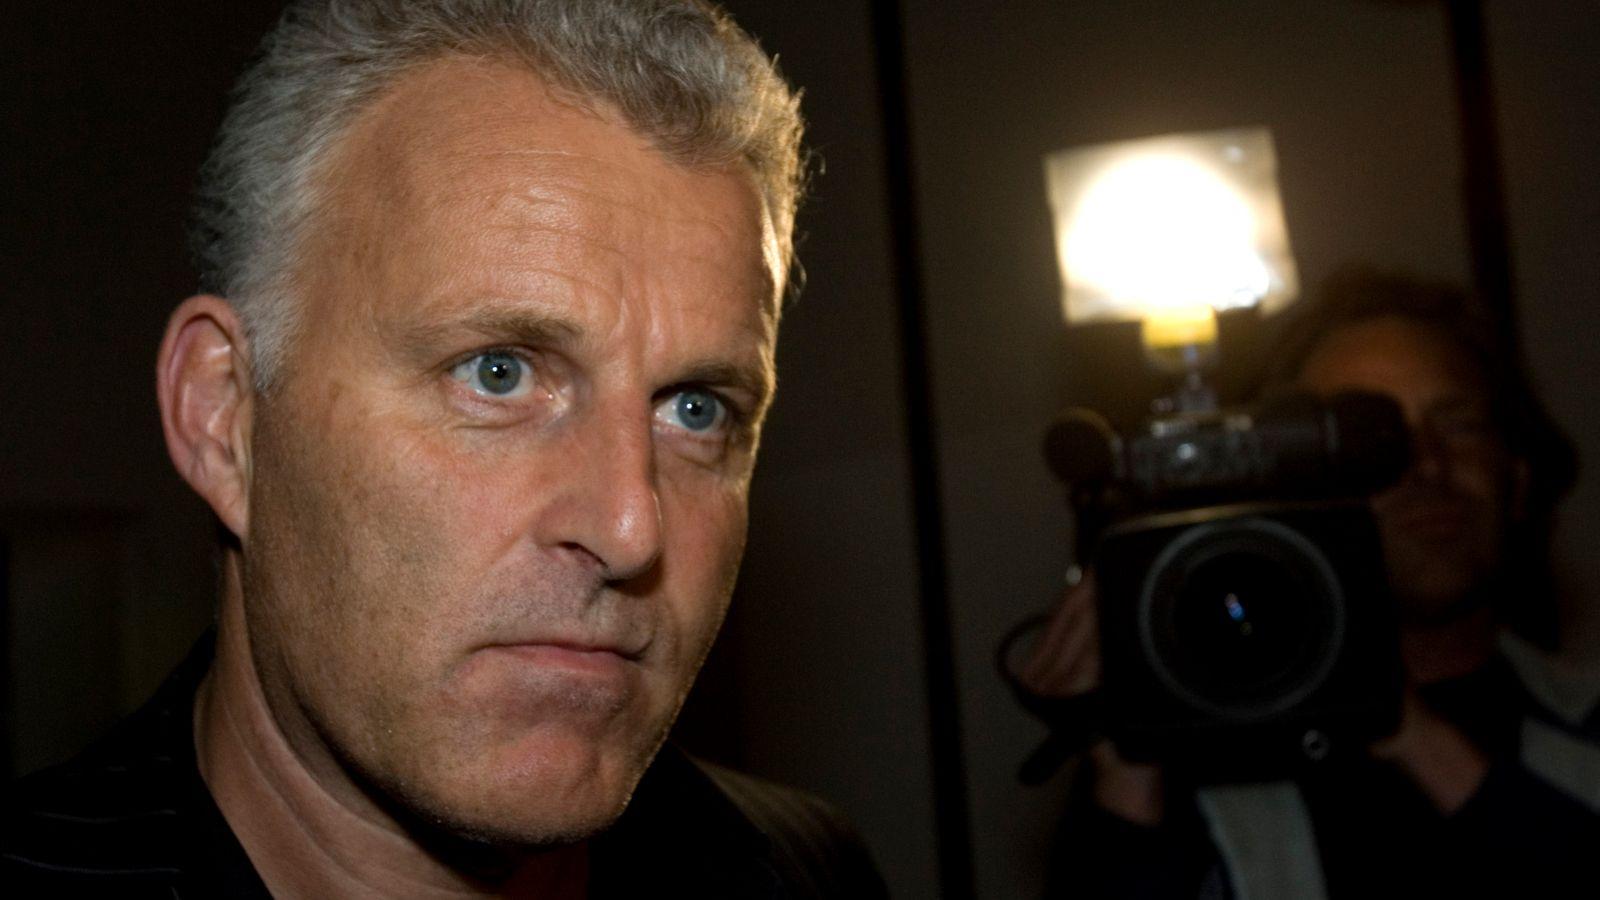 Peter R de Vries: Dutch crime reporter dies nine days after being shot in Amsterdam